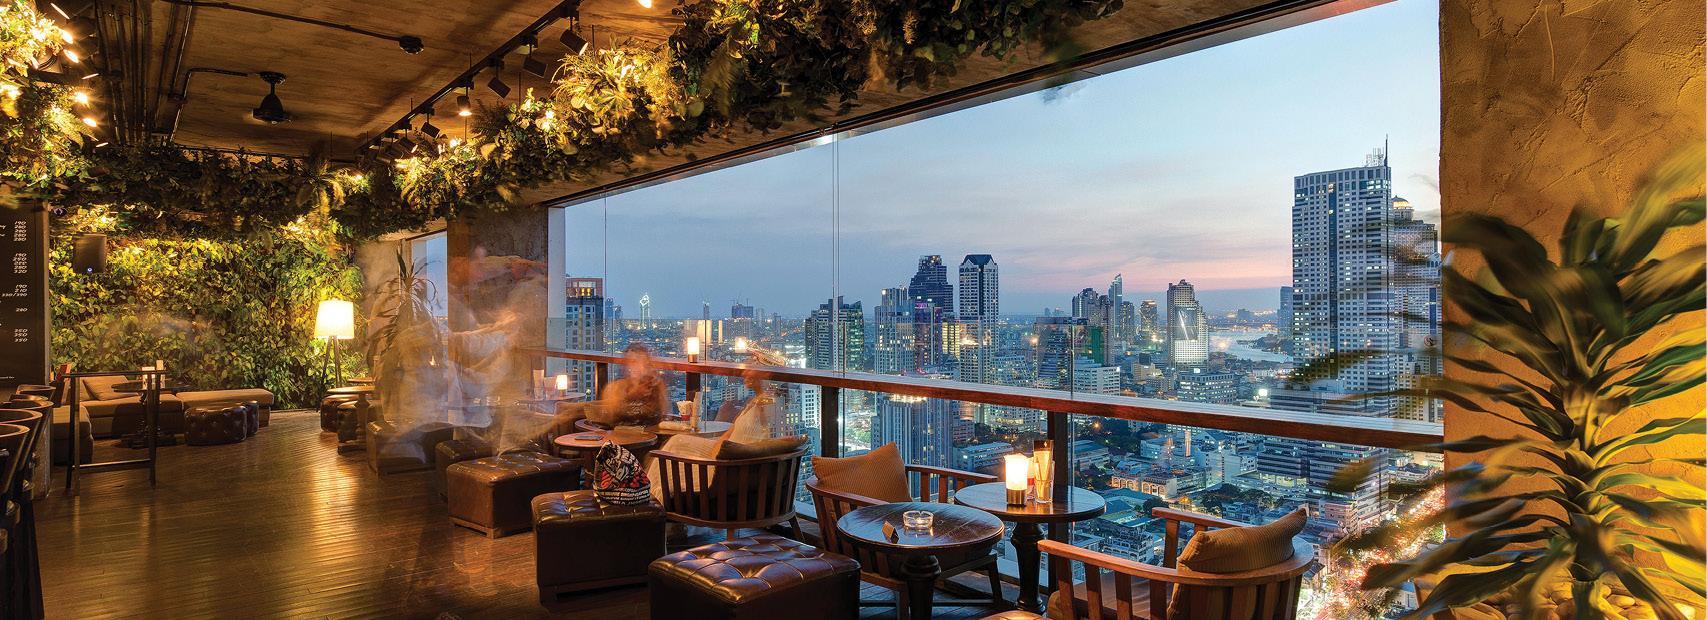 9 Of Bangkok S Best French Restaurants Bk Magazine Online